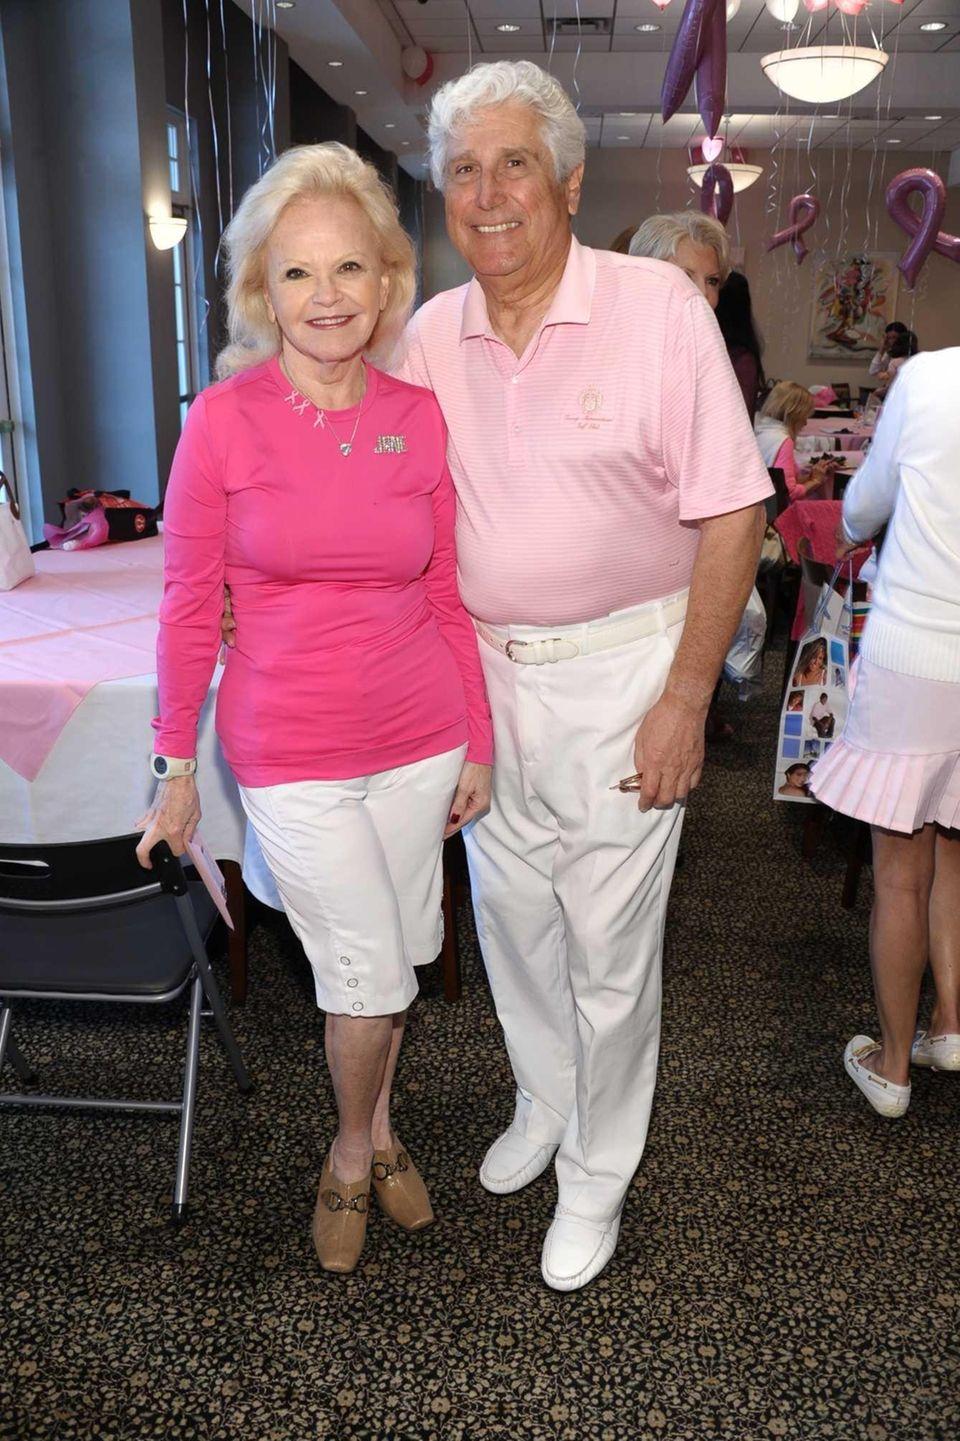 Chairperson Jane Pontarelli and Joe Pontarelli attend the